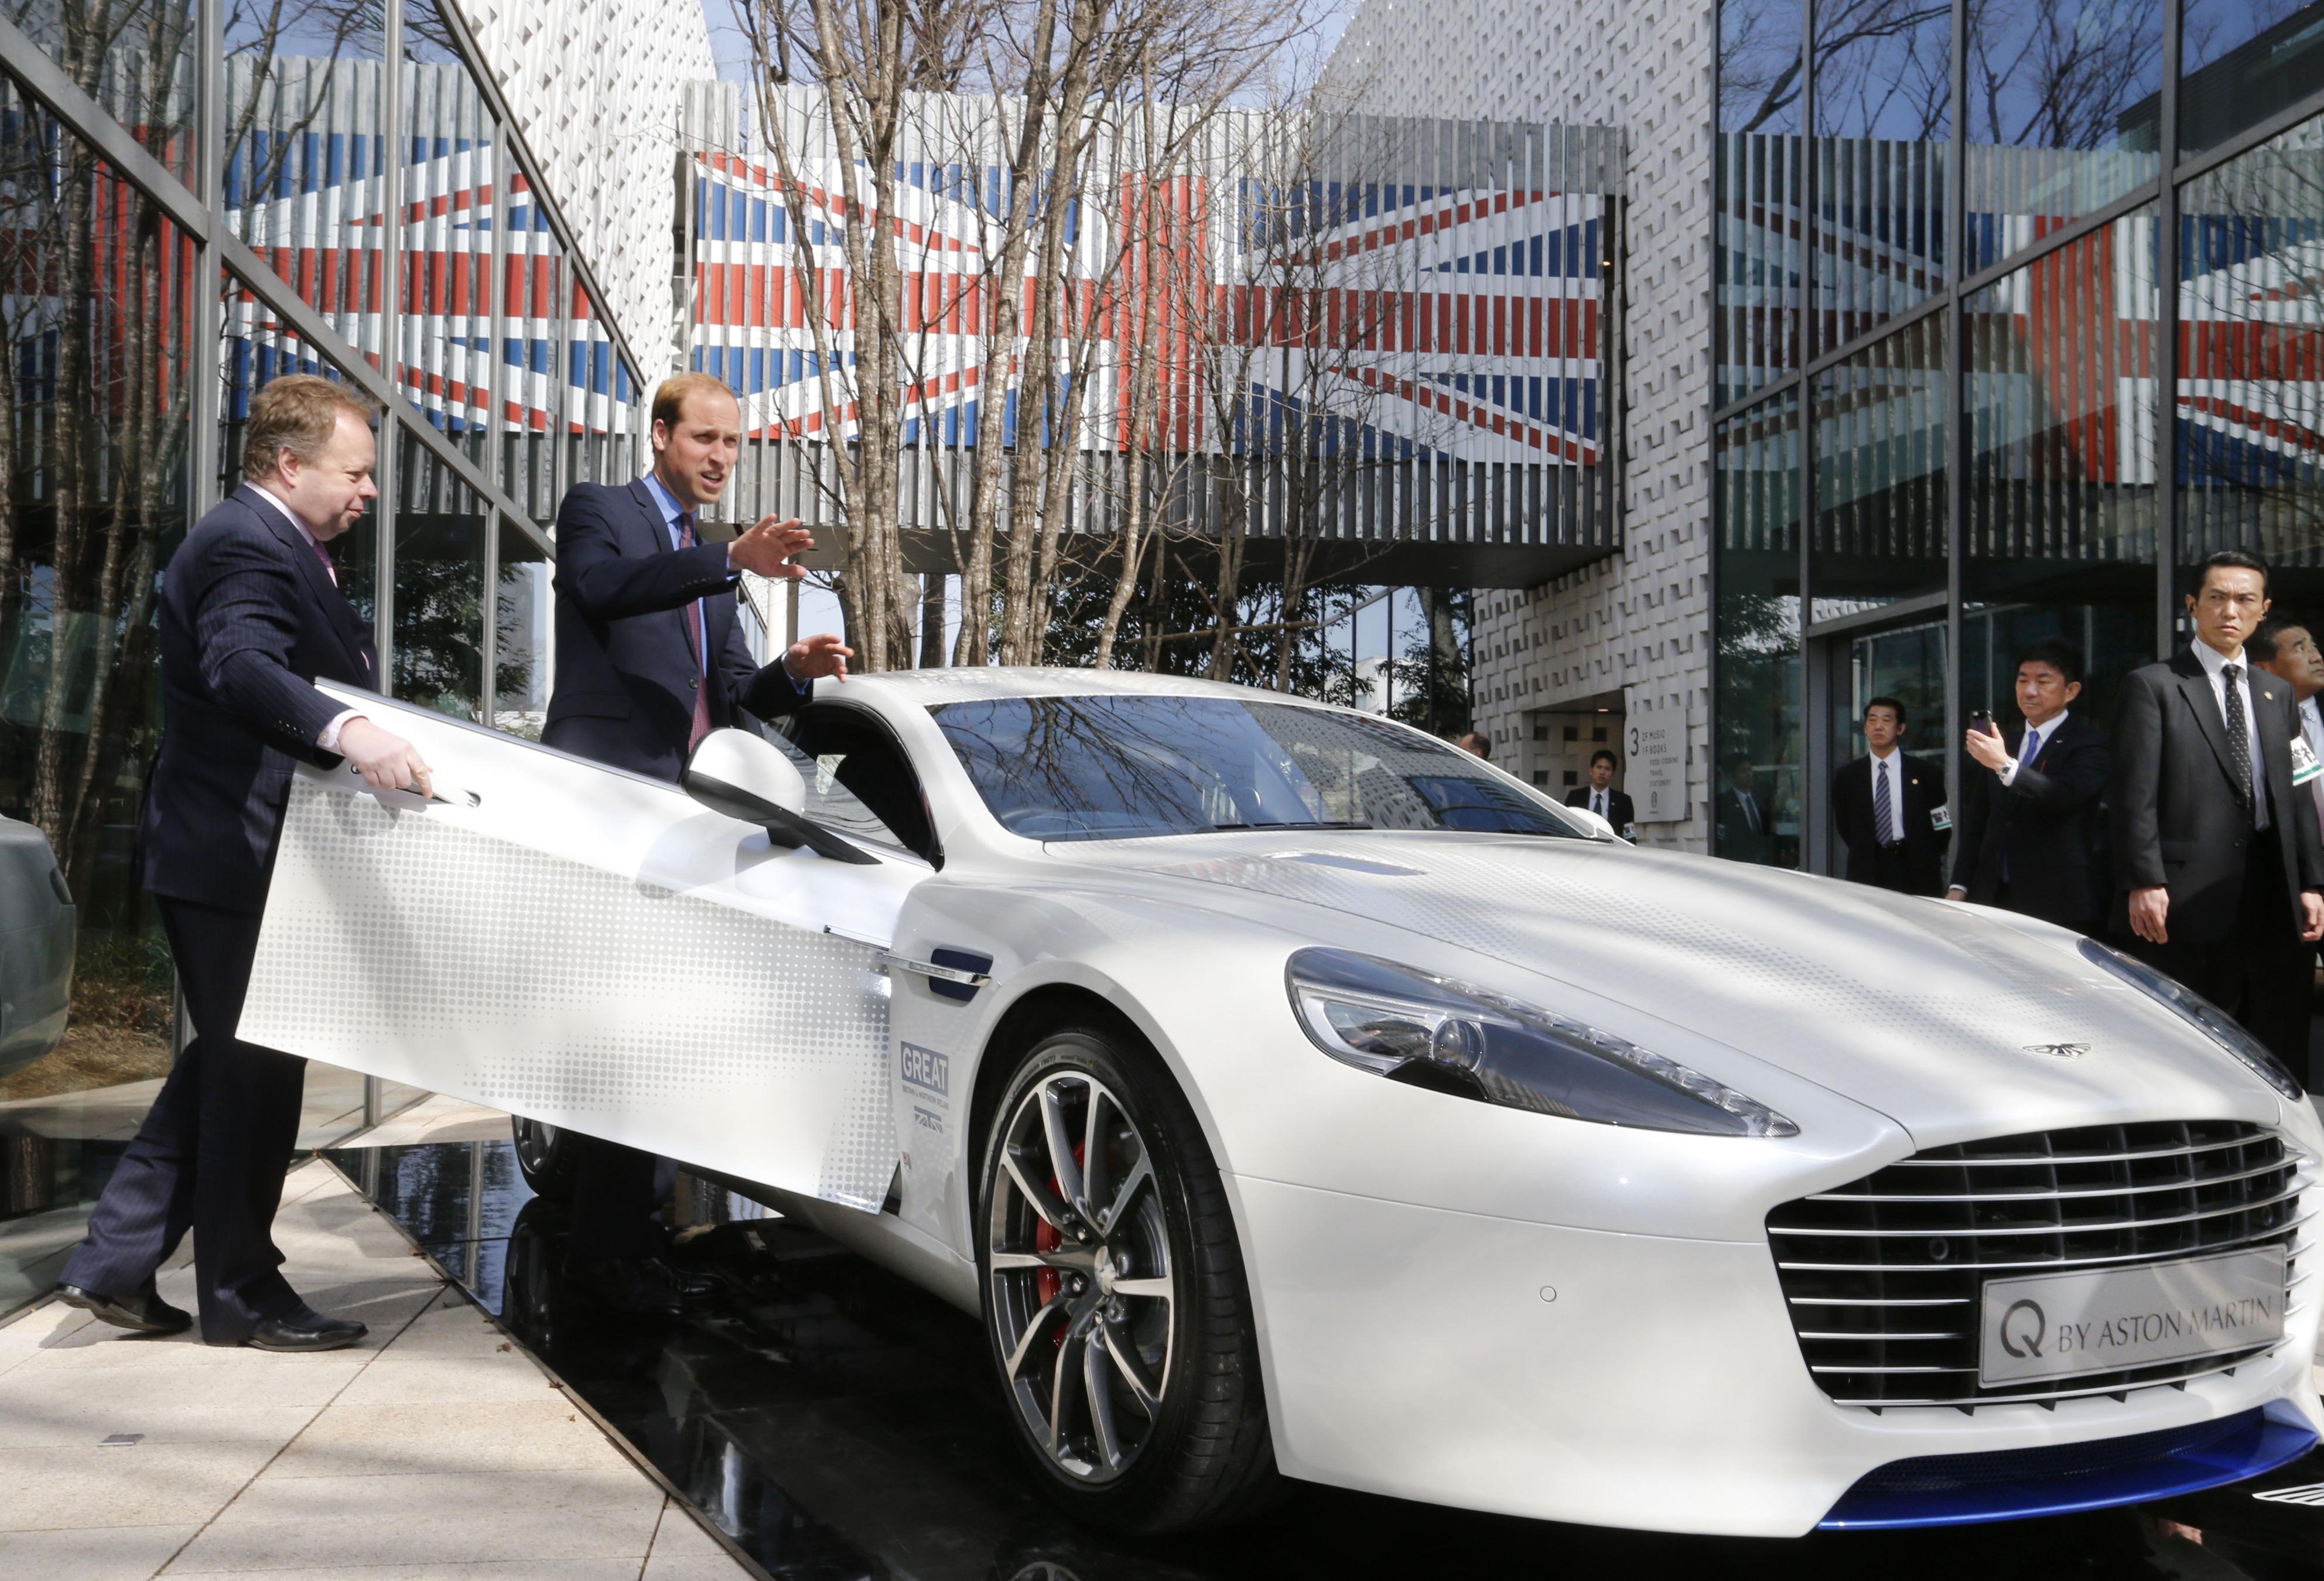 APTOPIX Japan Britain Royal Visit nyang sheboygan press 4